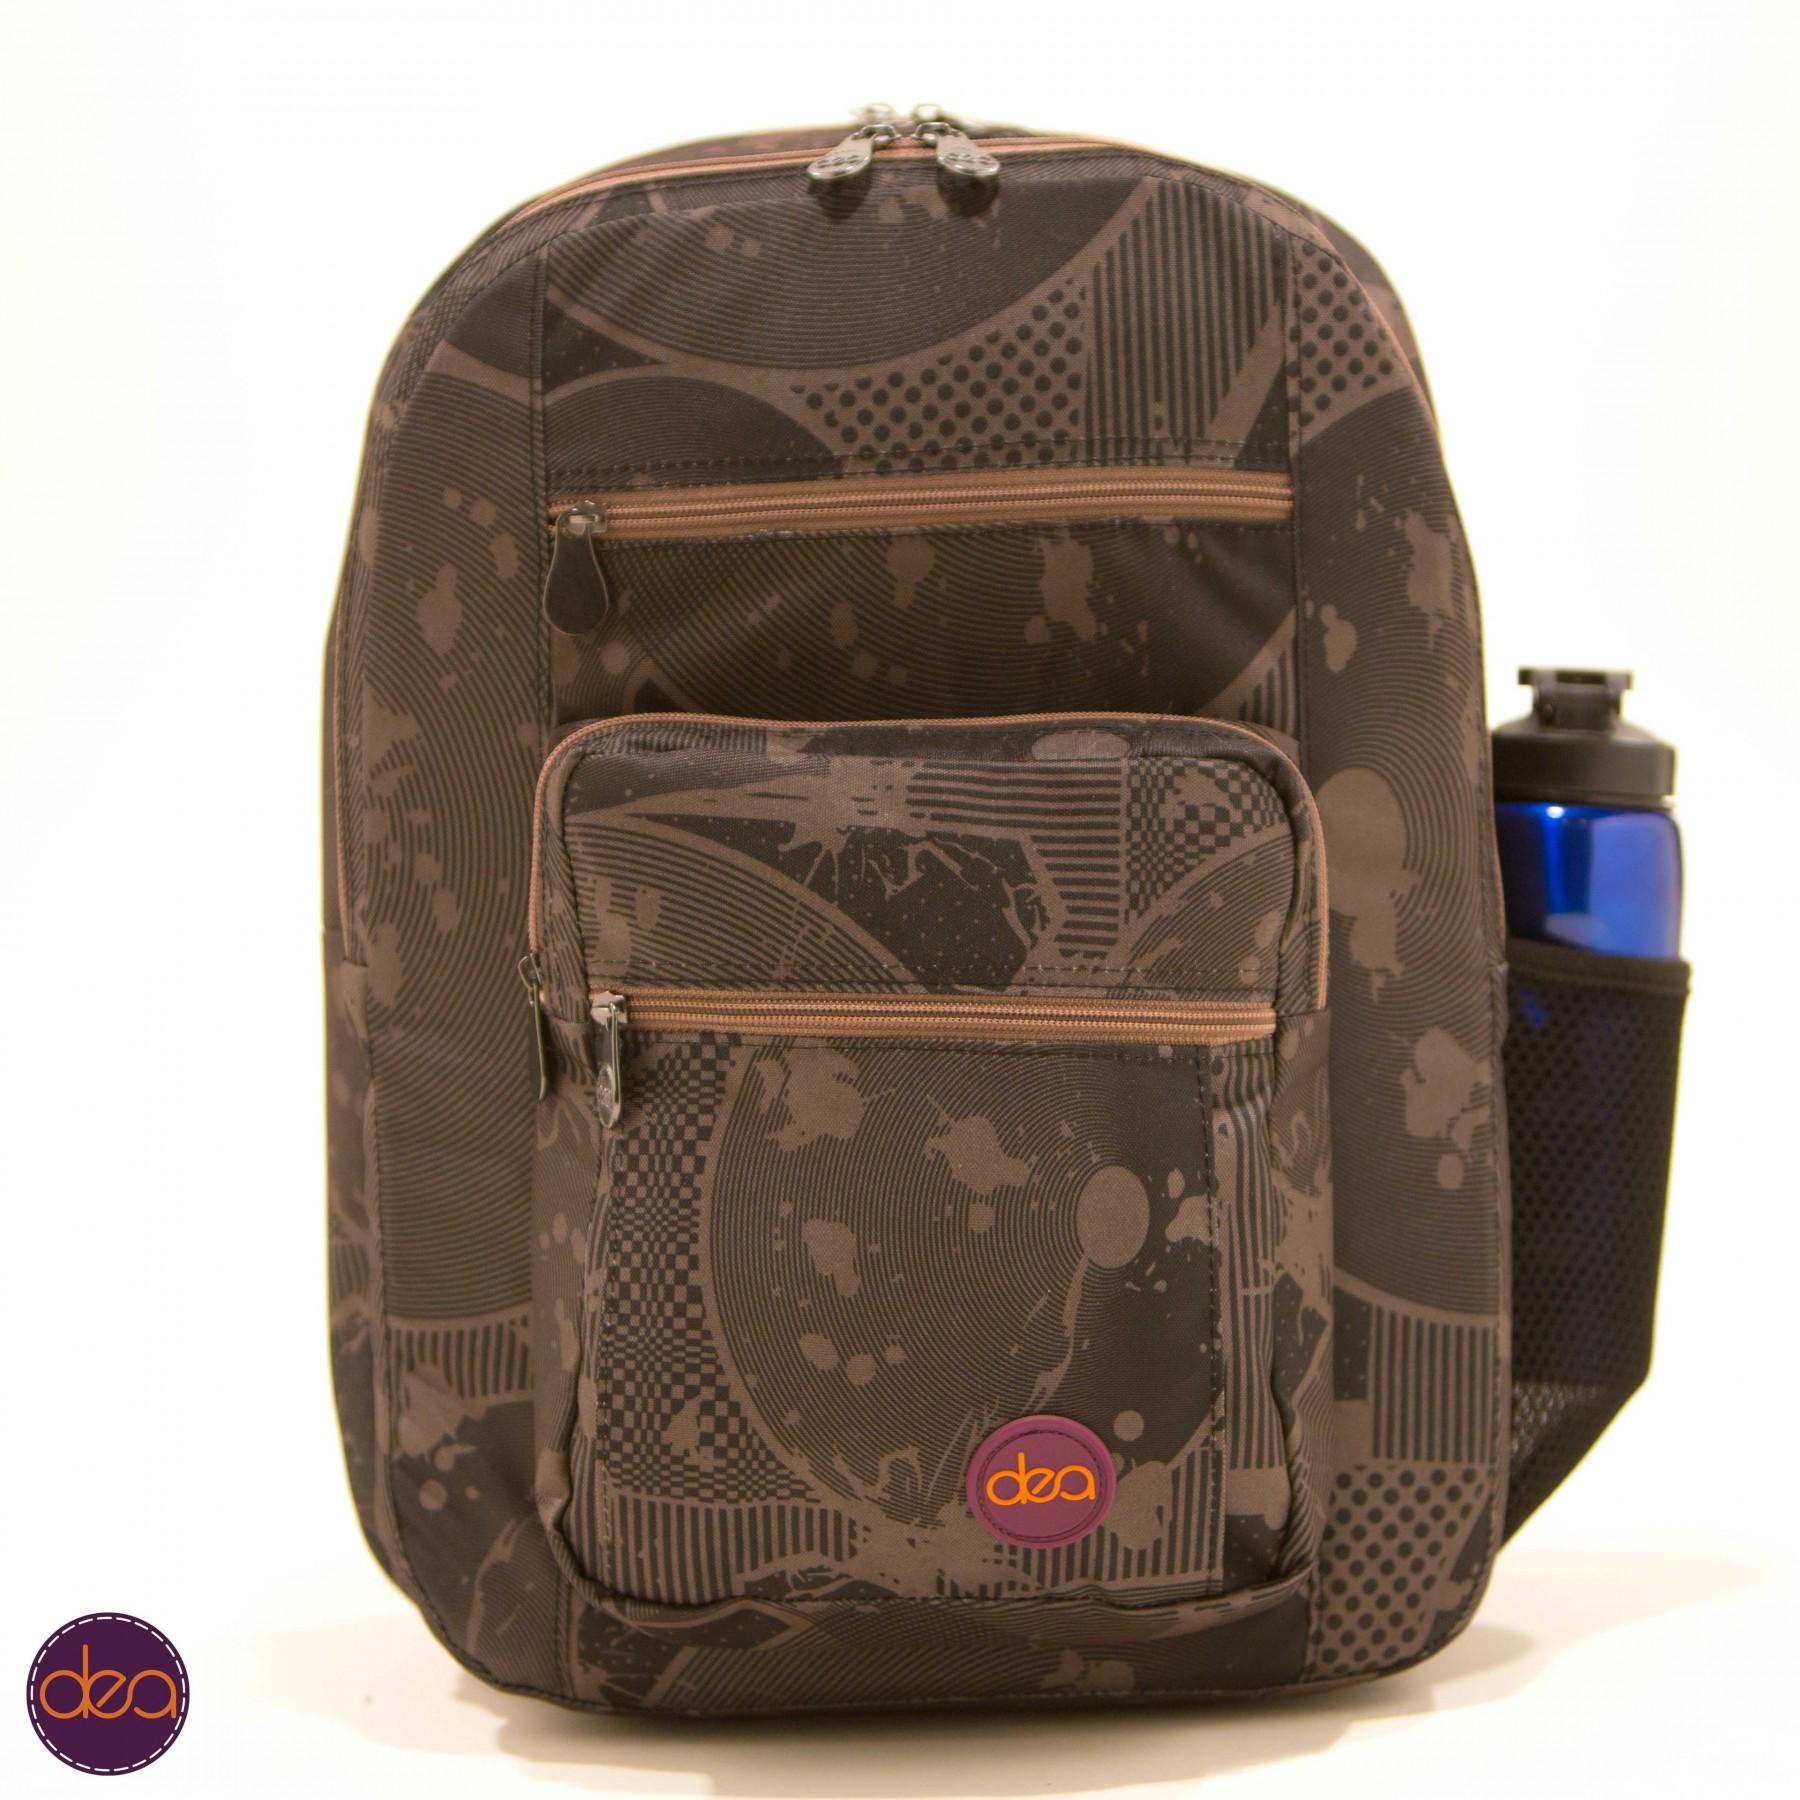 5- Galaxy Dea Bags